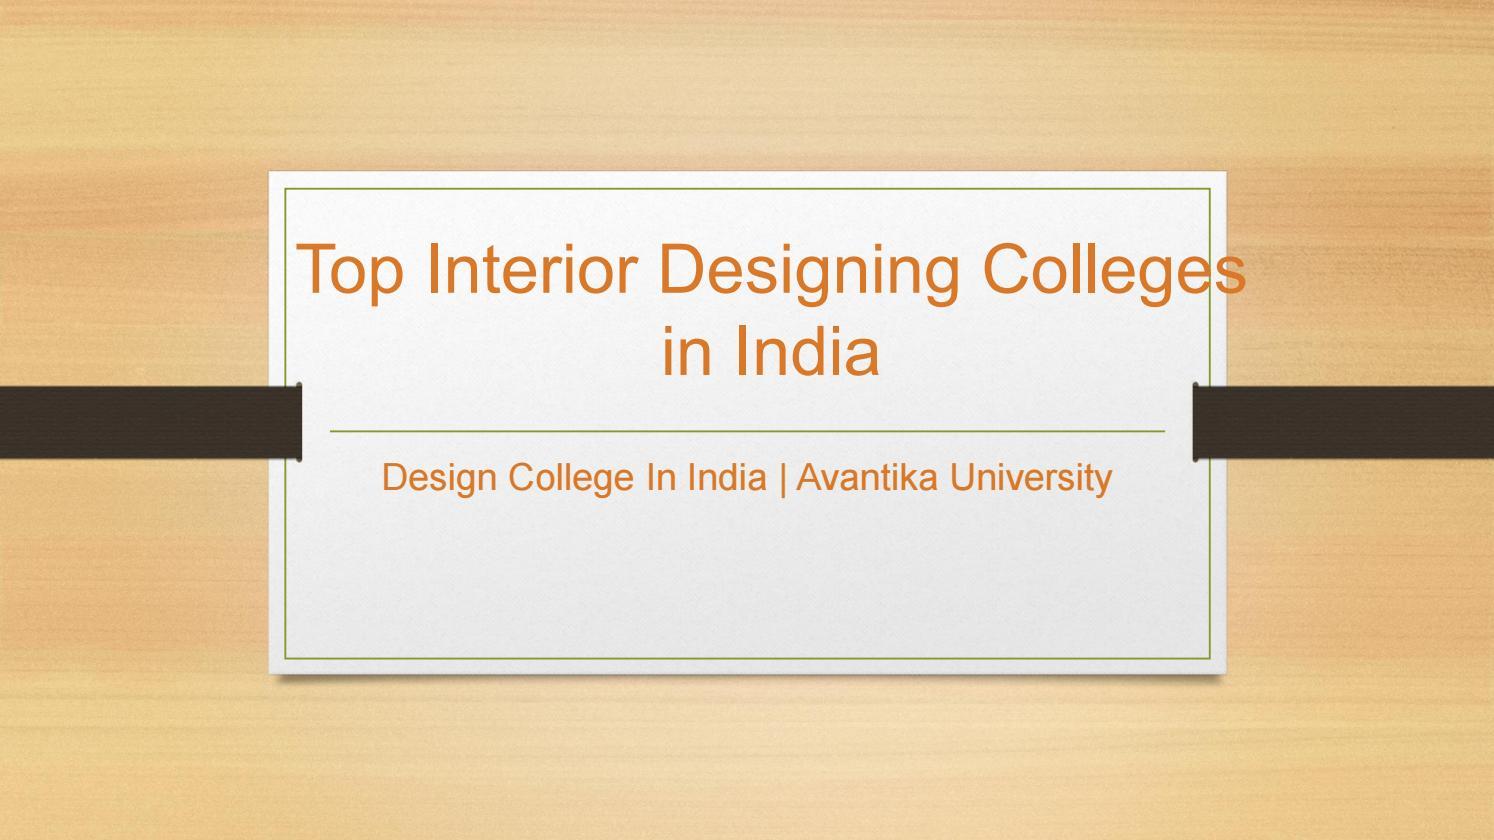 Top Interior Designing Colleges In India Avantika University By Avantika University Issuu